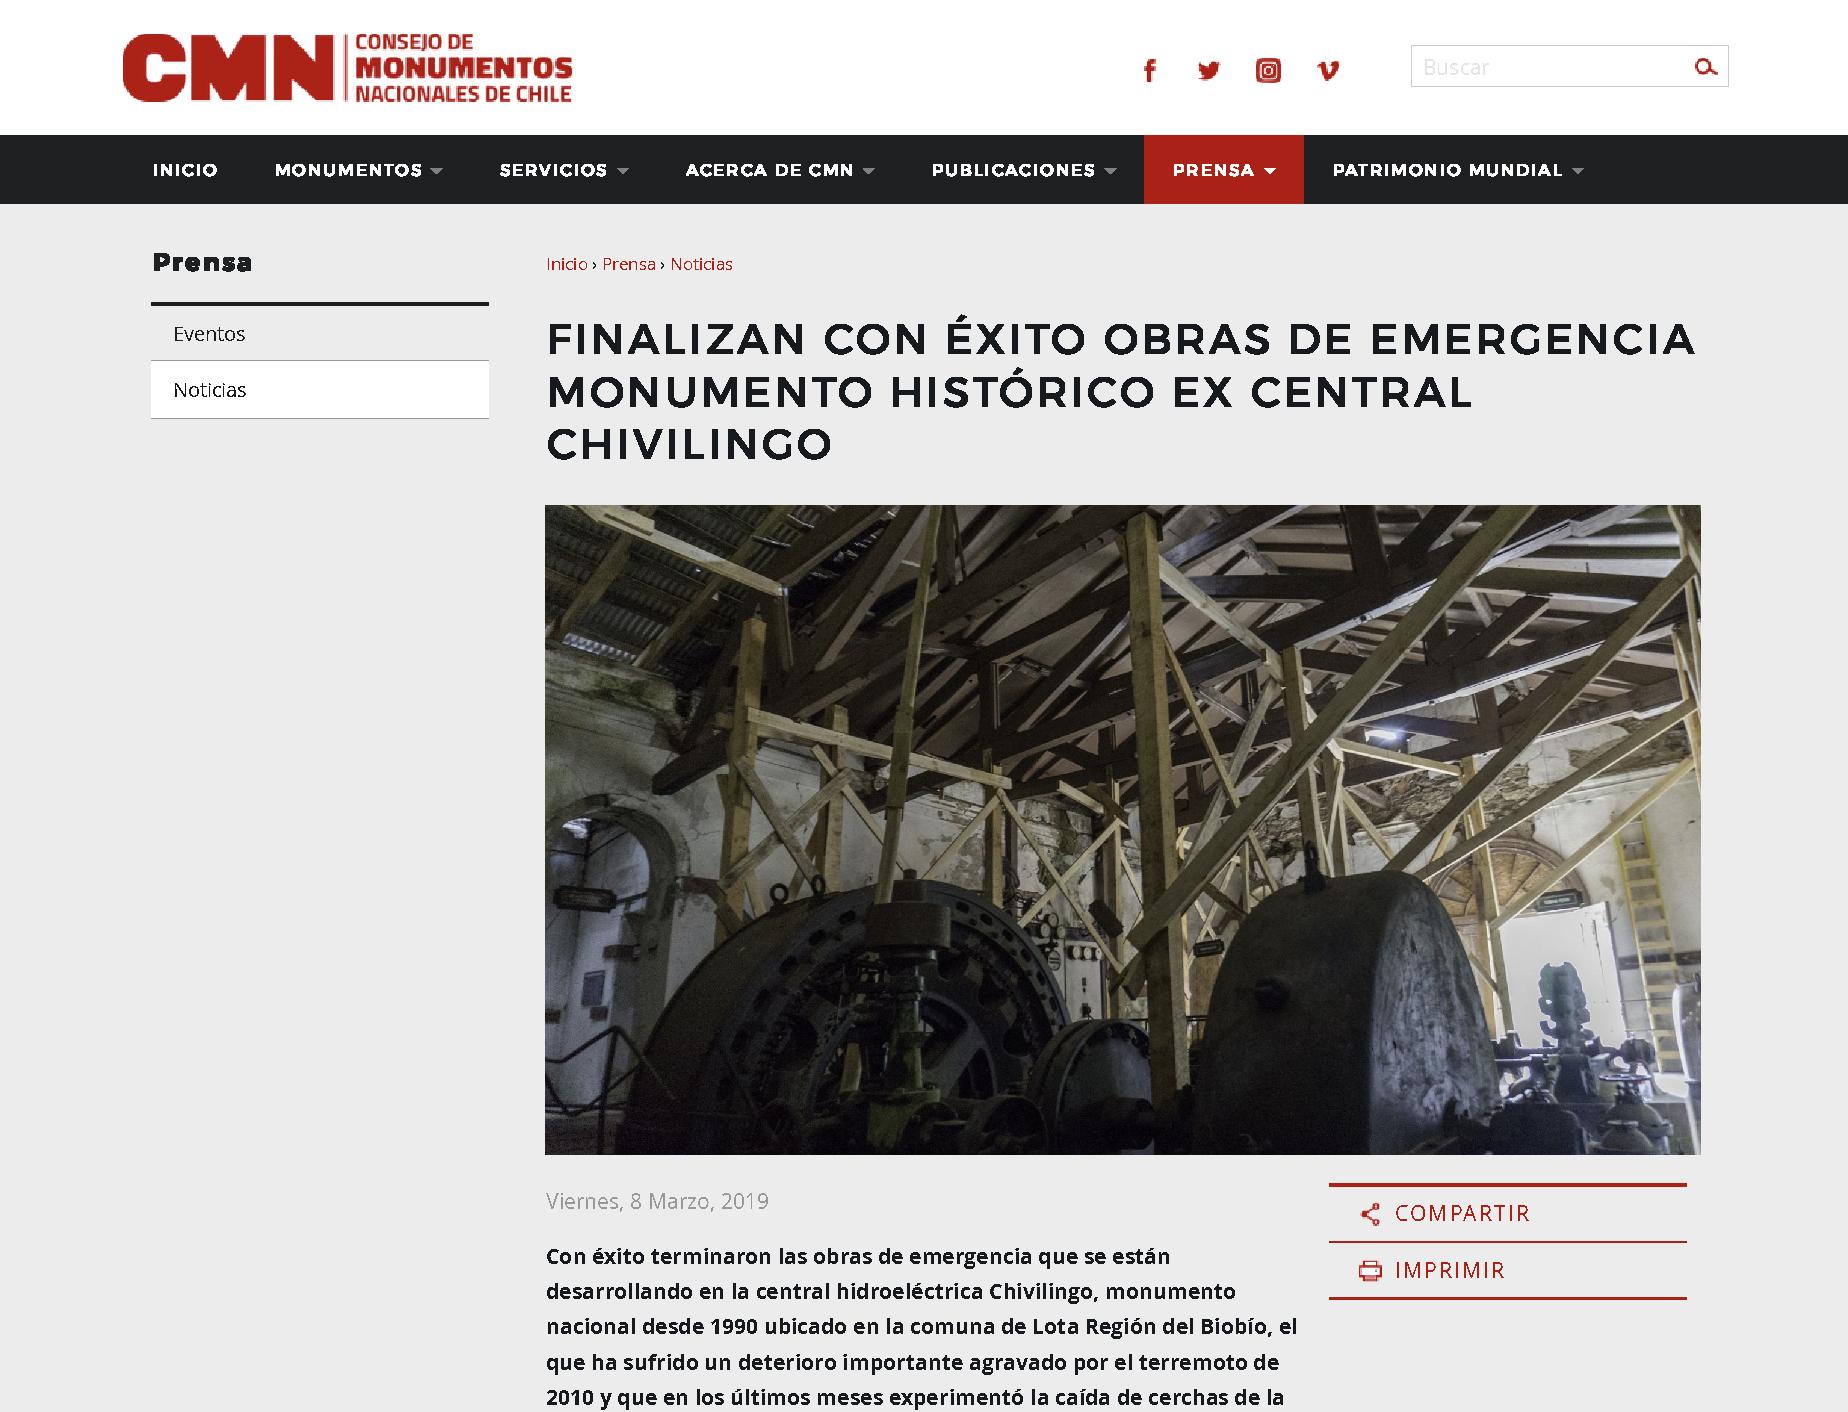 Finalizan con éxito obras de emergencia Monumento Histórico Ex Central Chivilingo